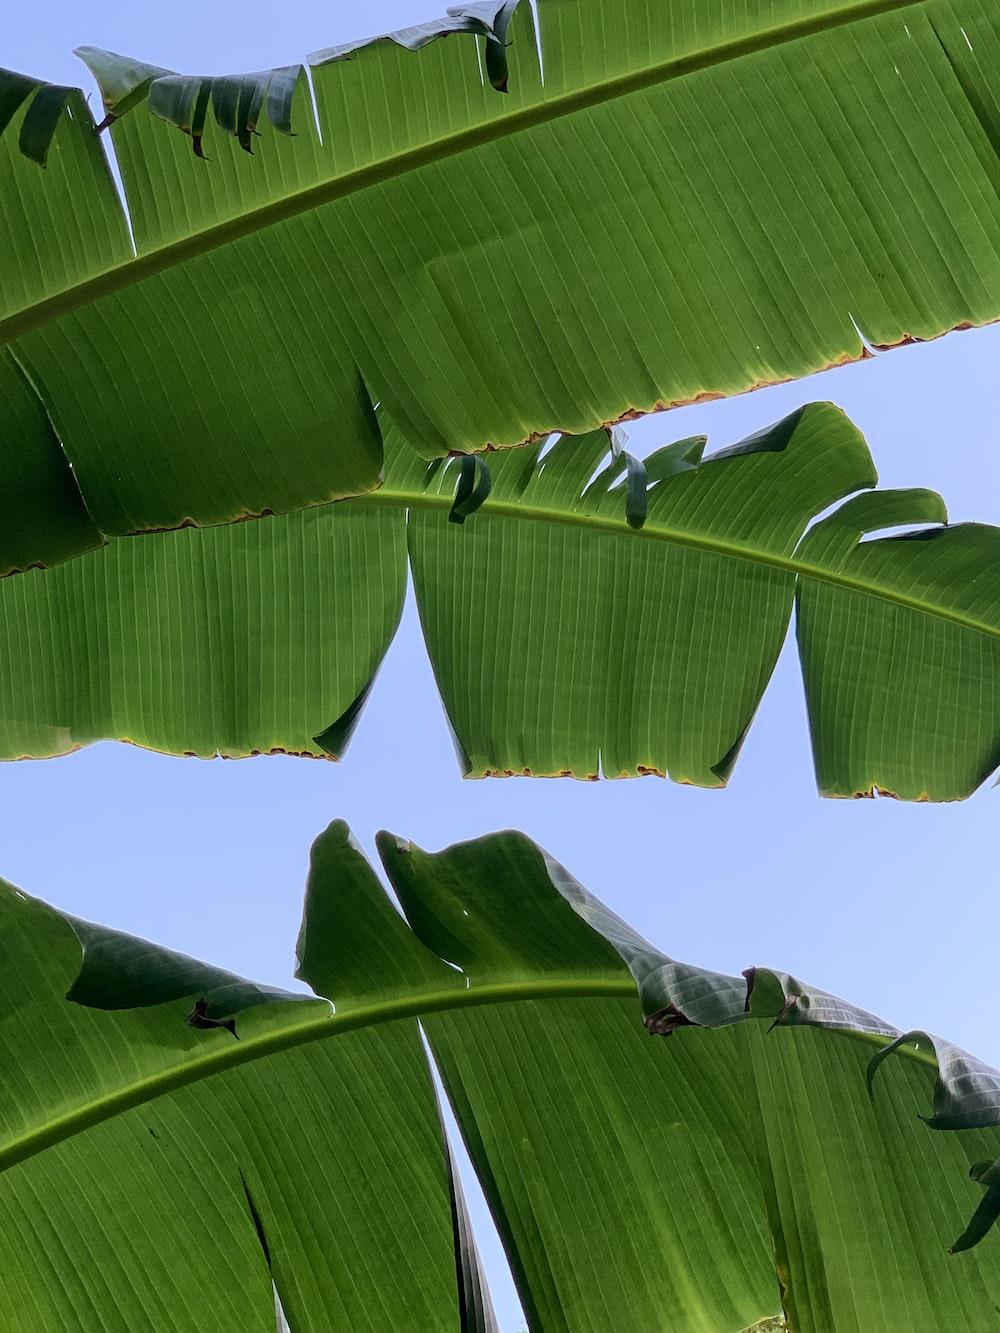 banana tree under blue sky during daytime